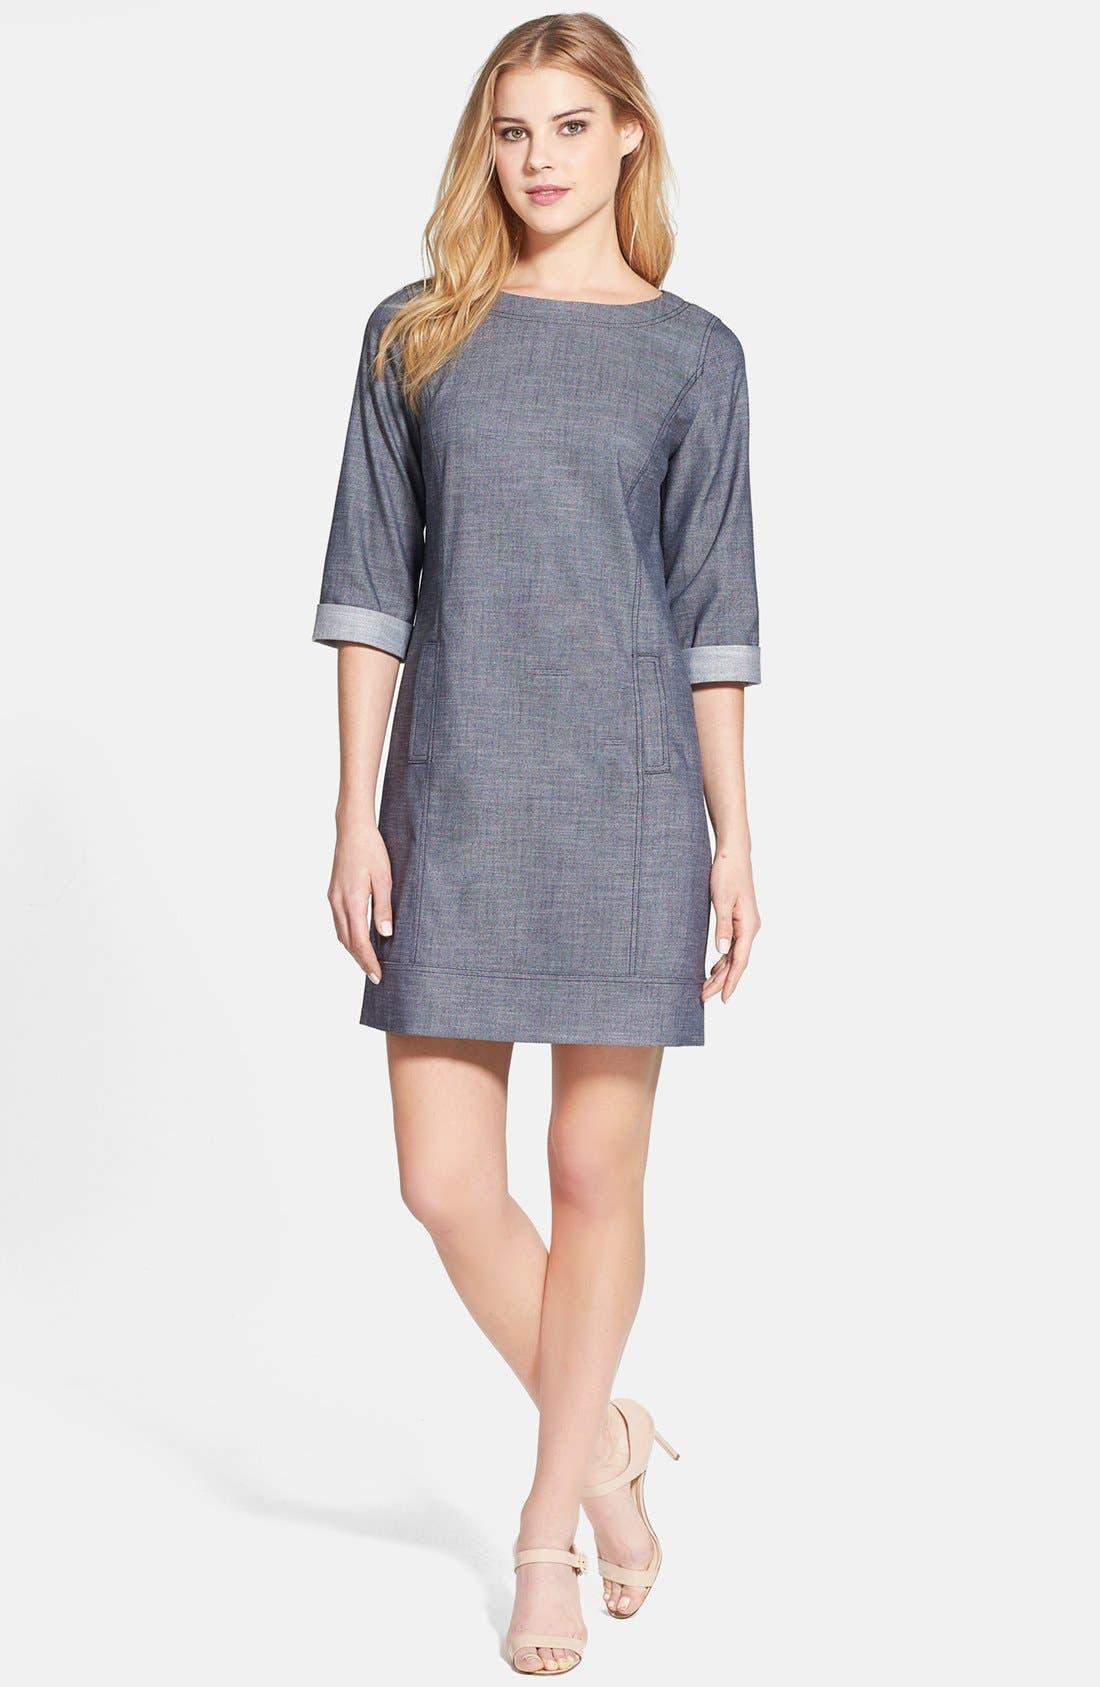 Alternate Image 1 Selected - Halogen® 'Indigo Crosshatch' Shift Dress (Regular & Petite)